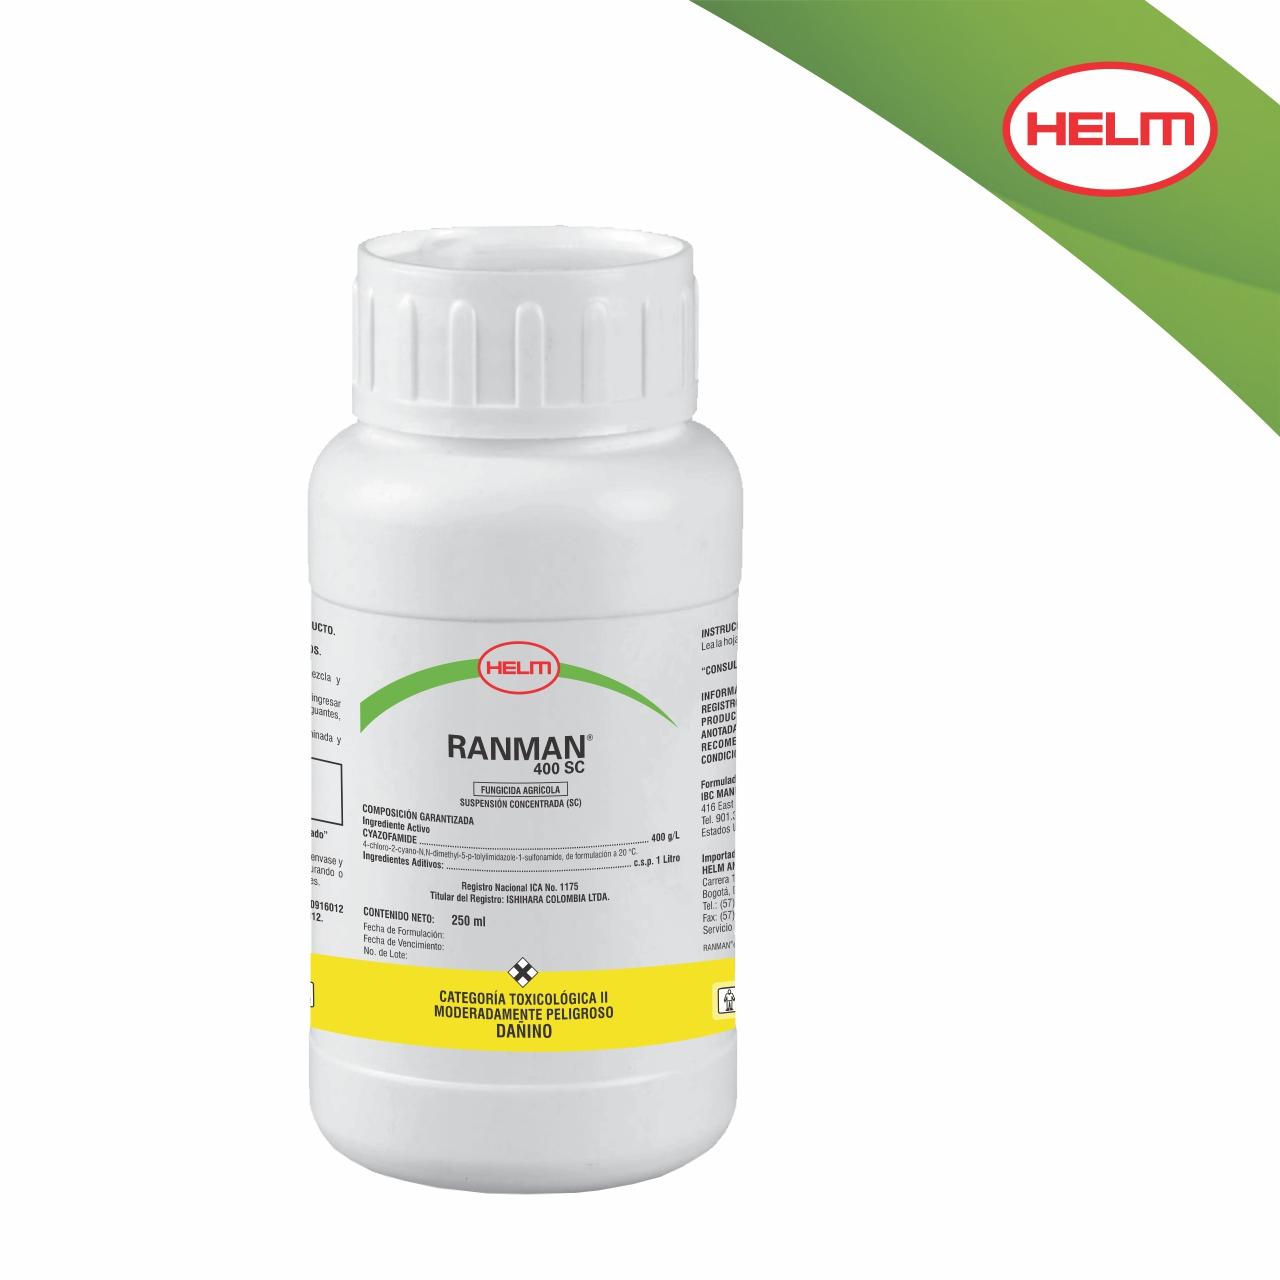 Fungicida-Ranman-Helm-Andina.jpg